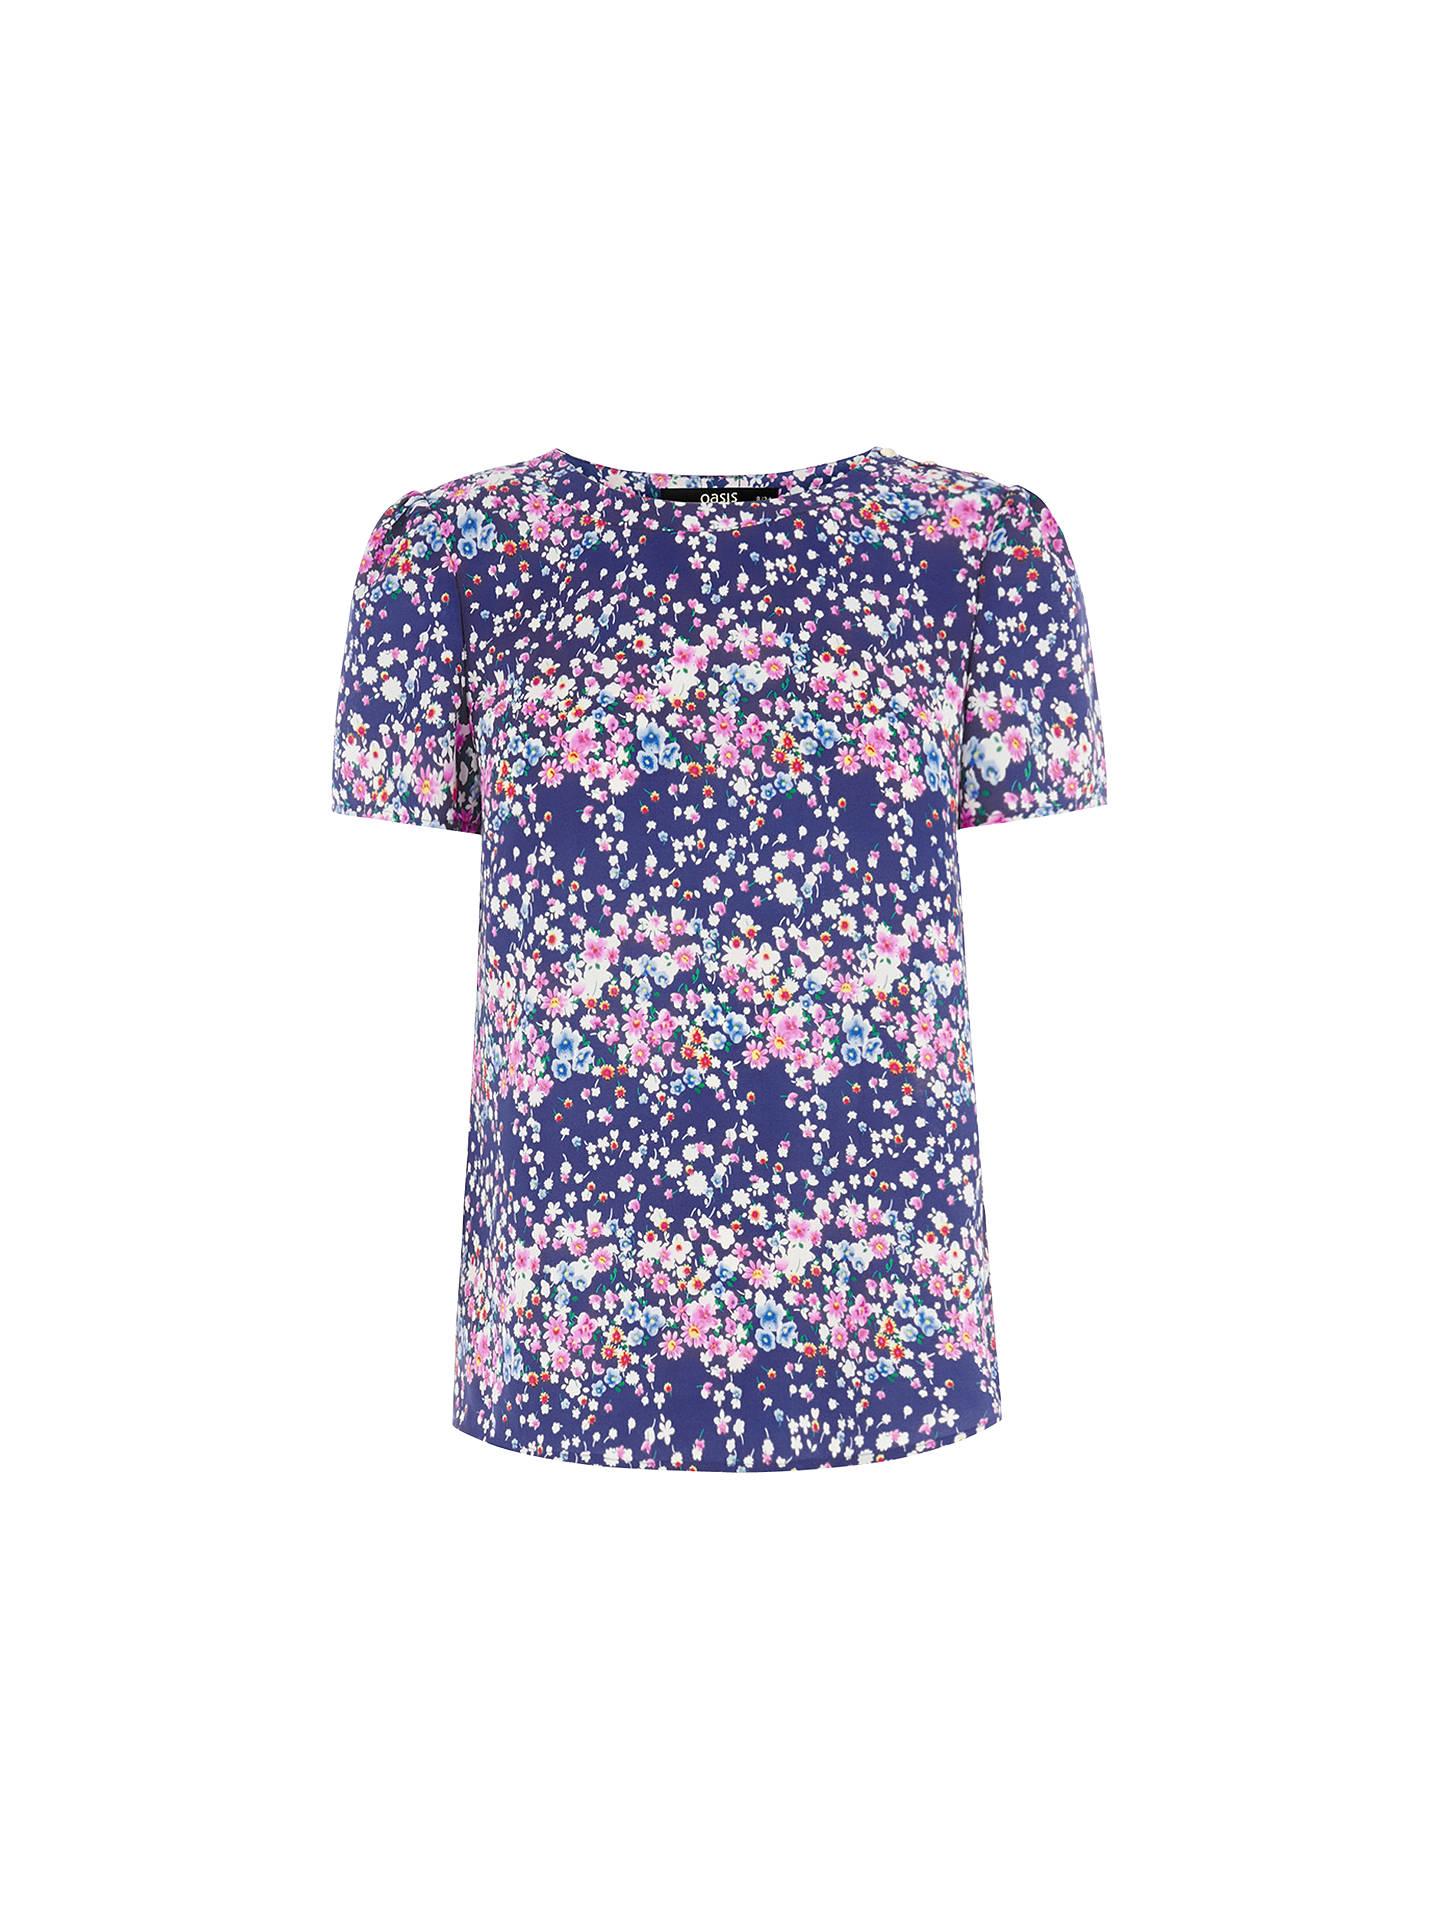 64fefa9ddcf43a Buy Oasis Falling Bloom Border Print T-Shirt